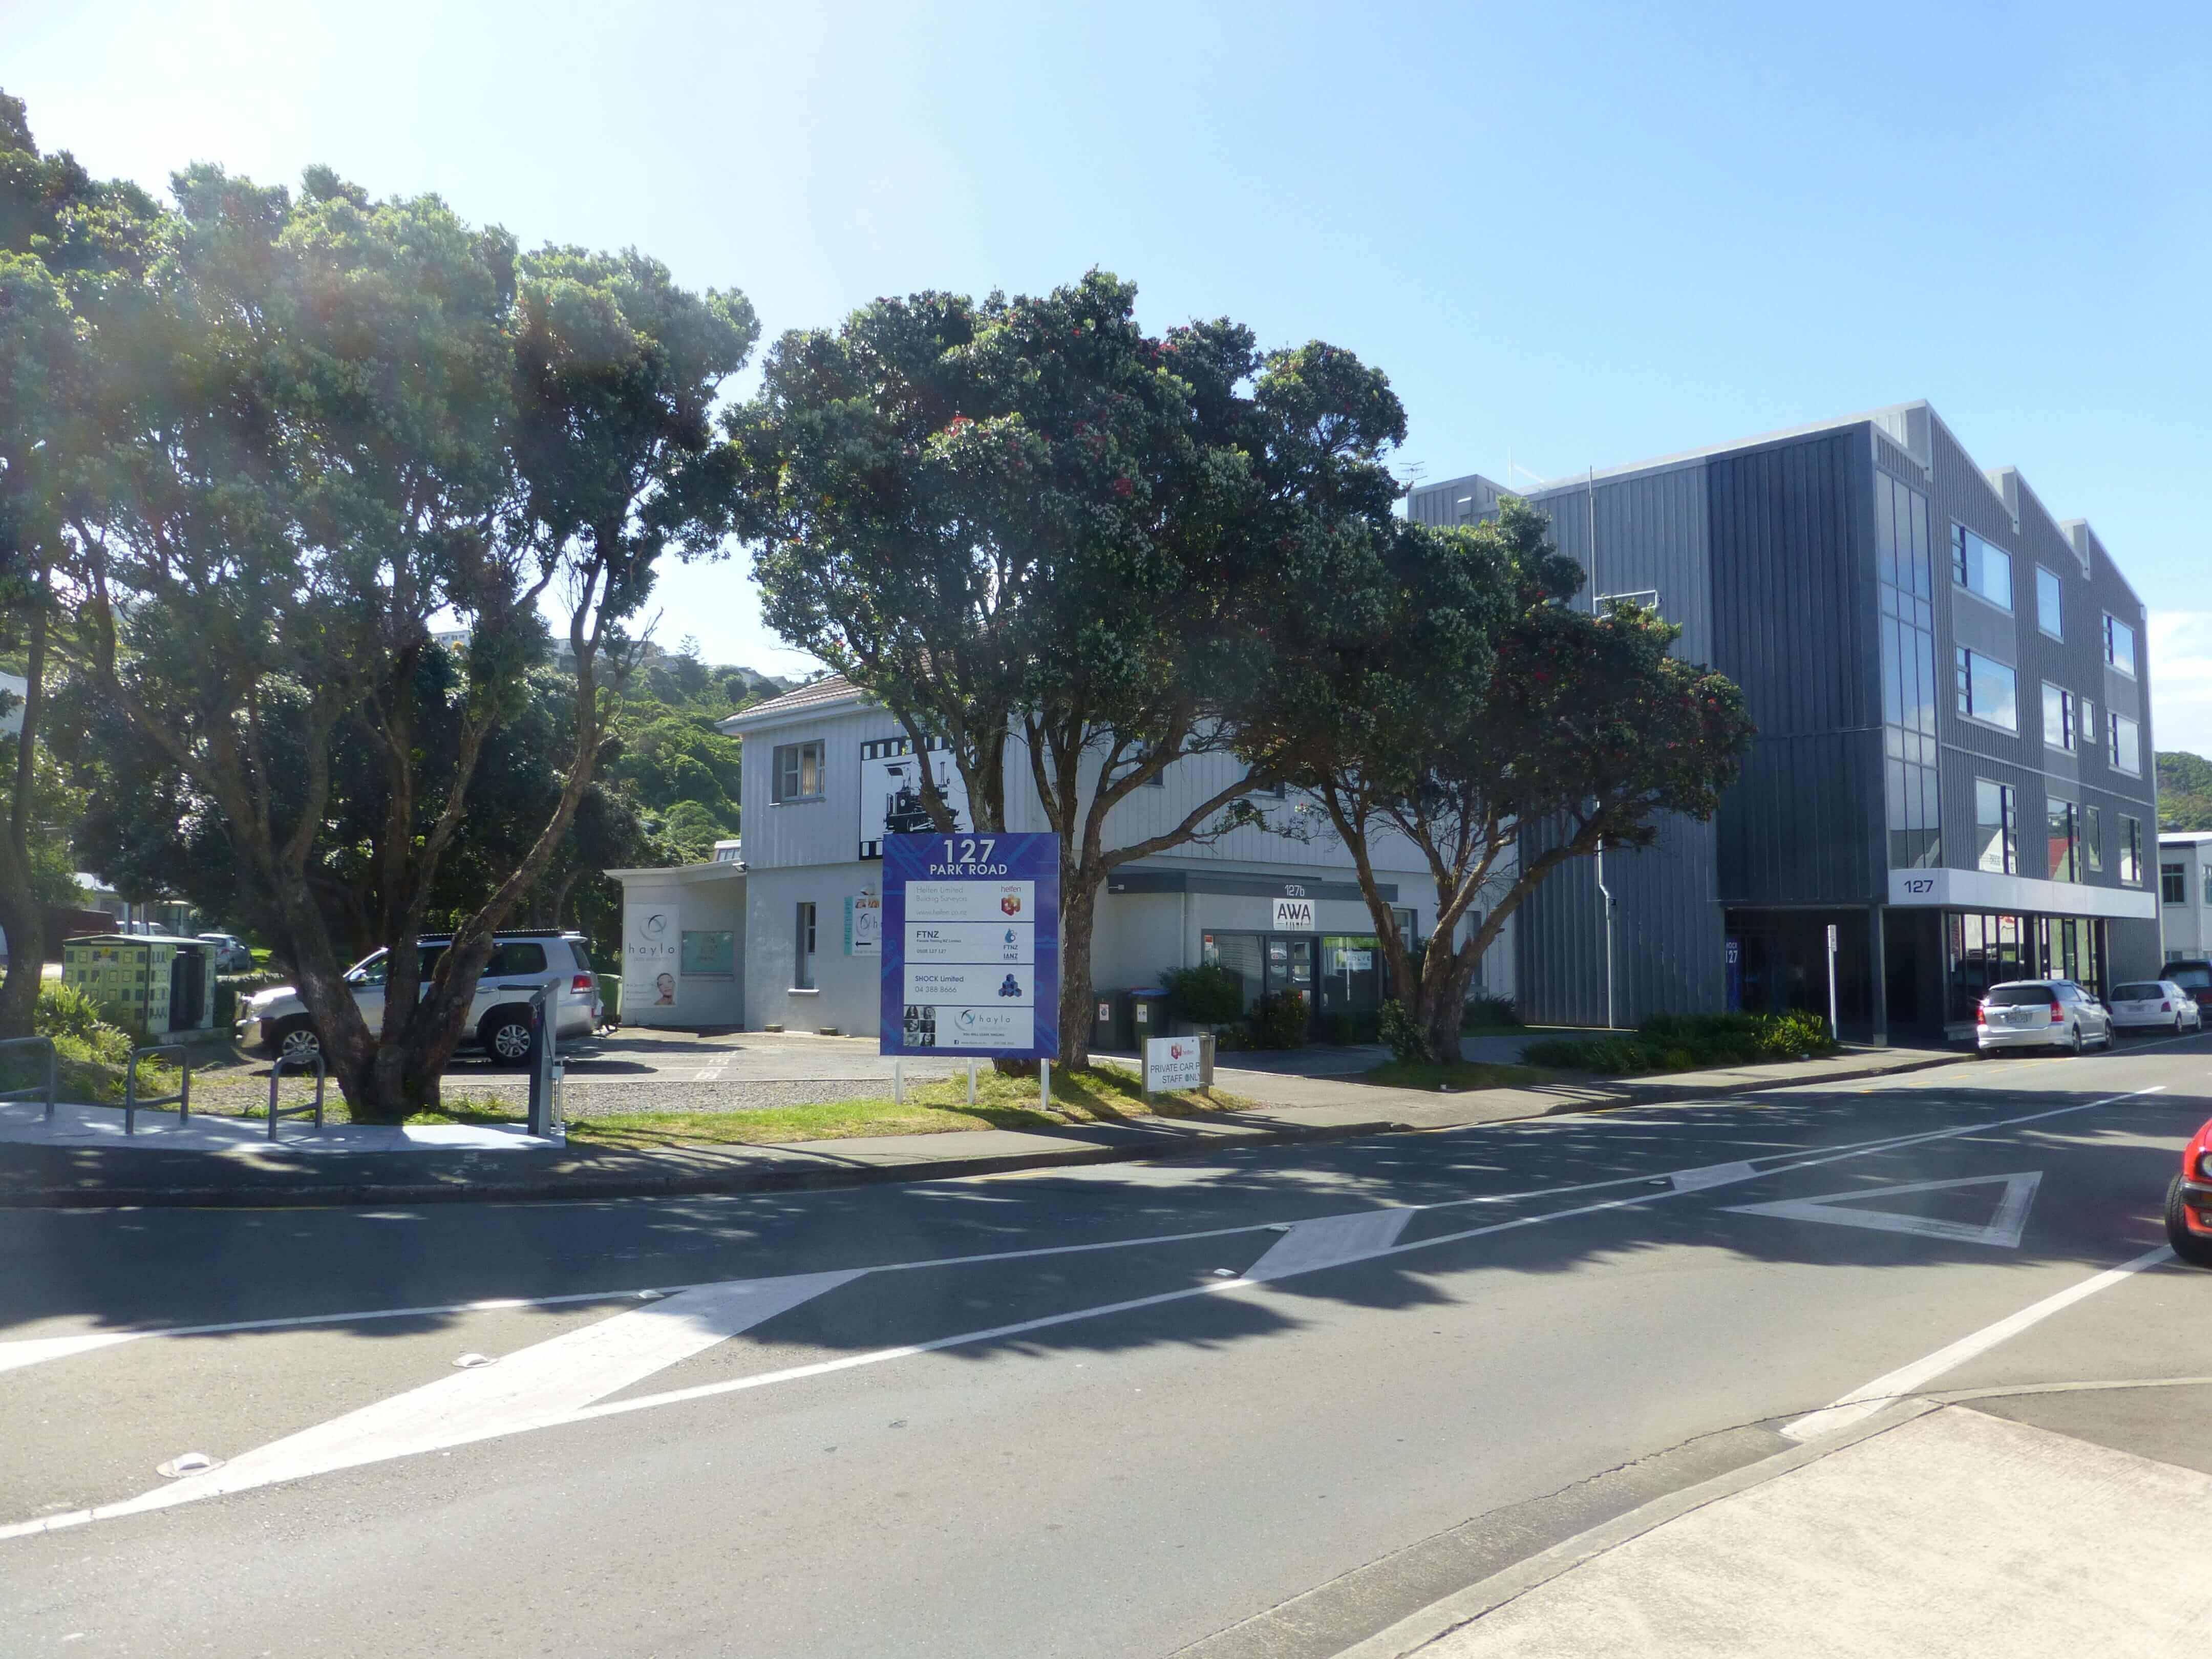 Wellington, in Miramar auf dem Weg zum Weta Shop, Weit-weg.reisen 19